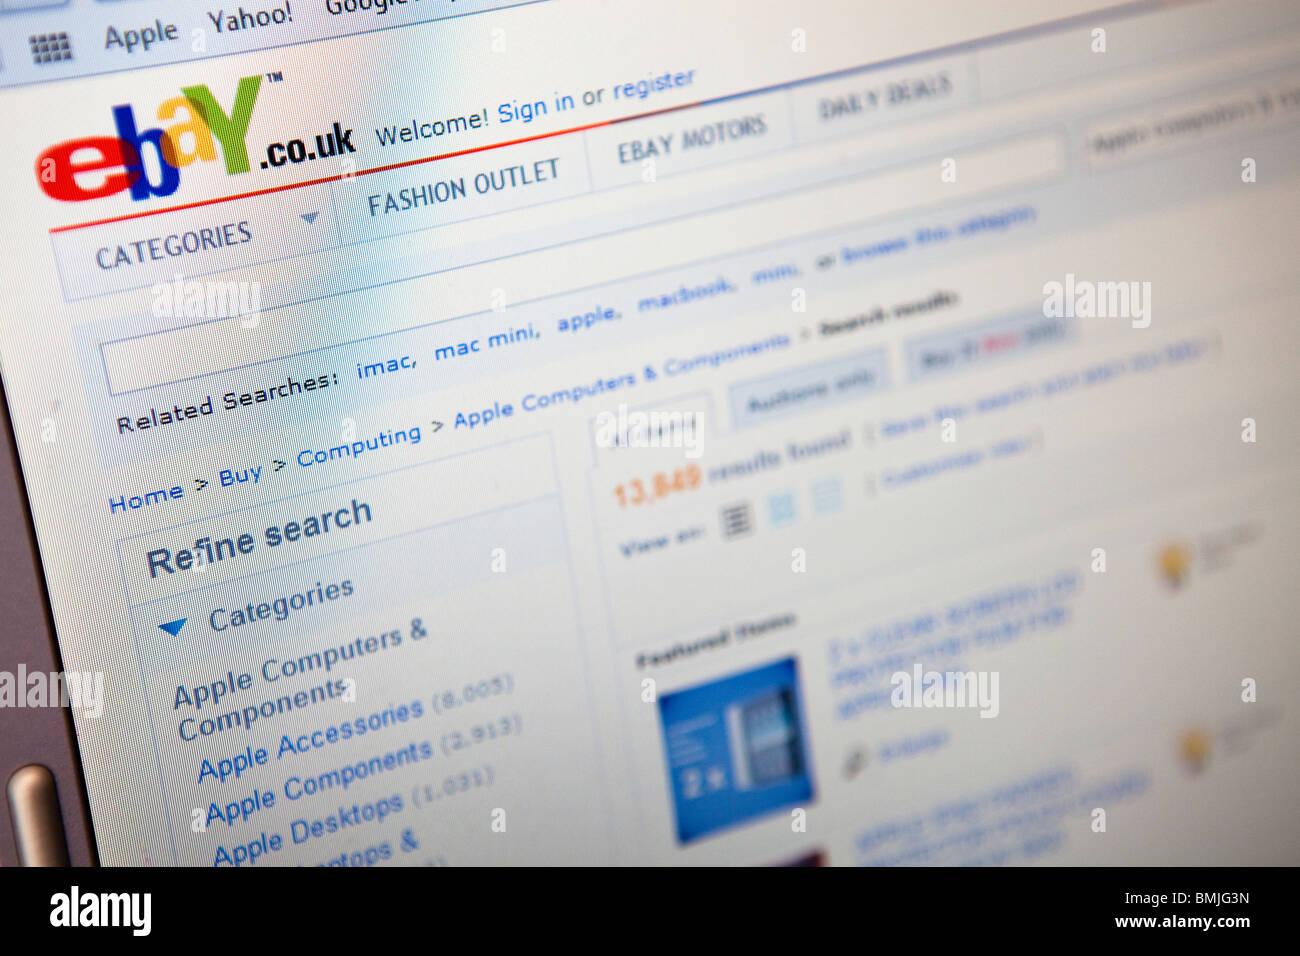 ebay stock photos ebay stock images page 3 alamy rh alamy com